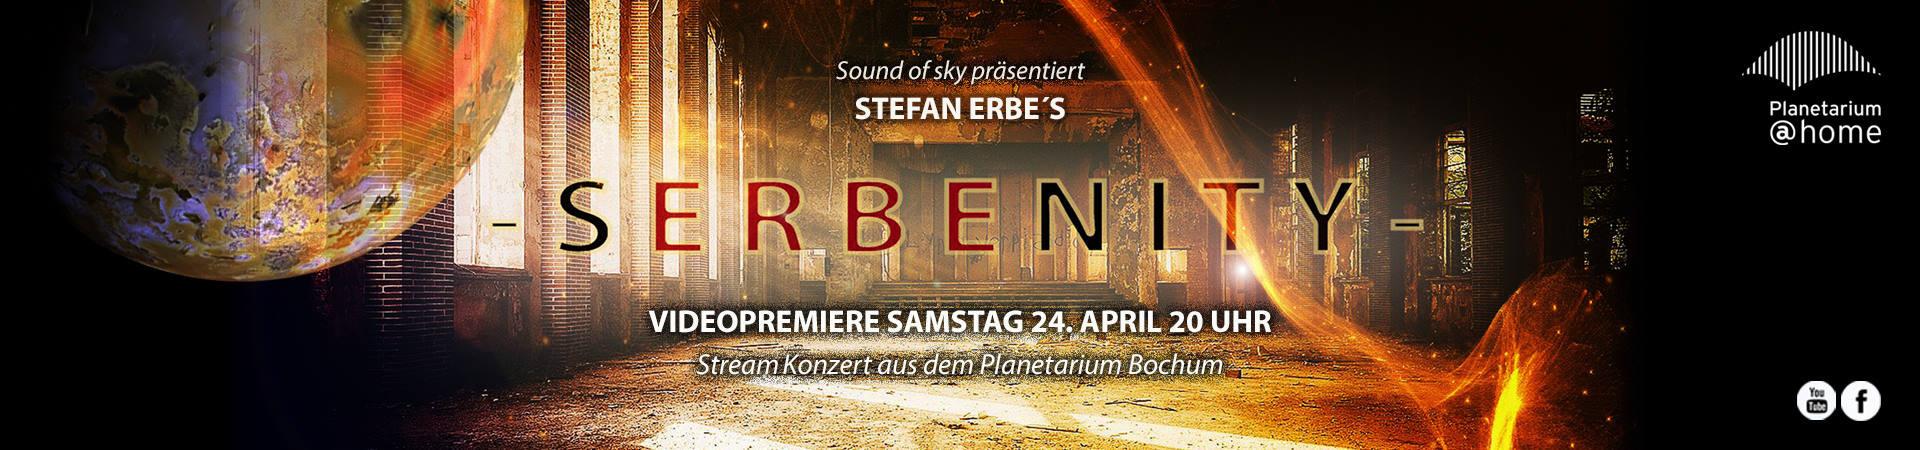 Stefan Erbe - Serbenity_header